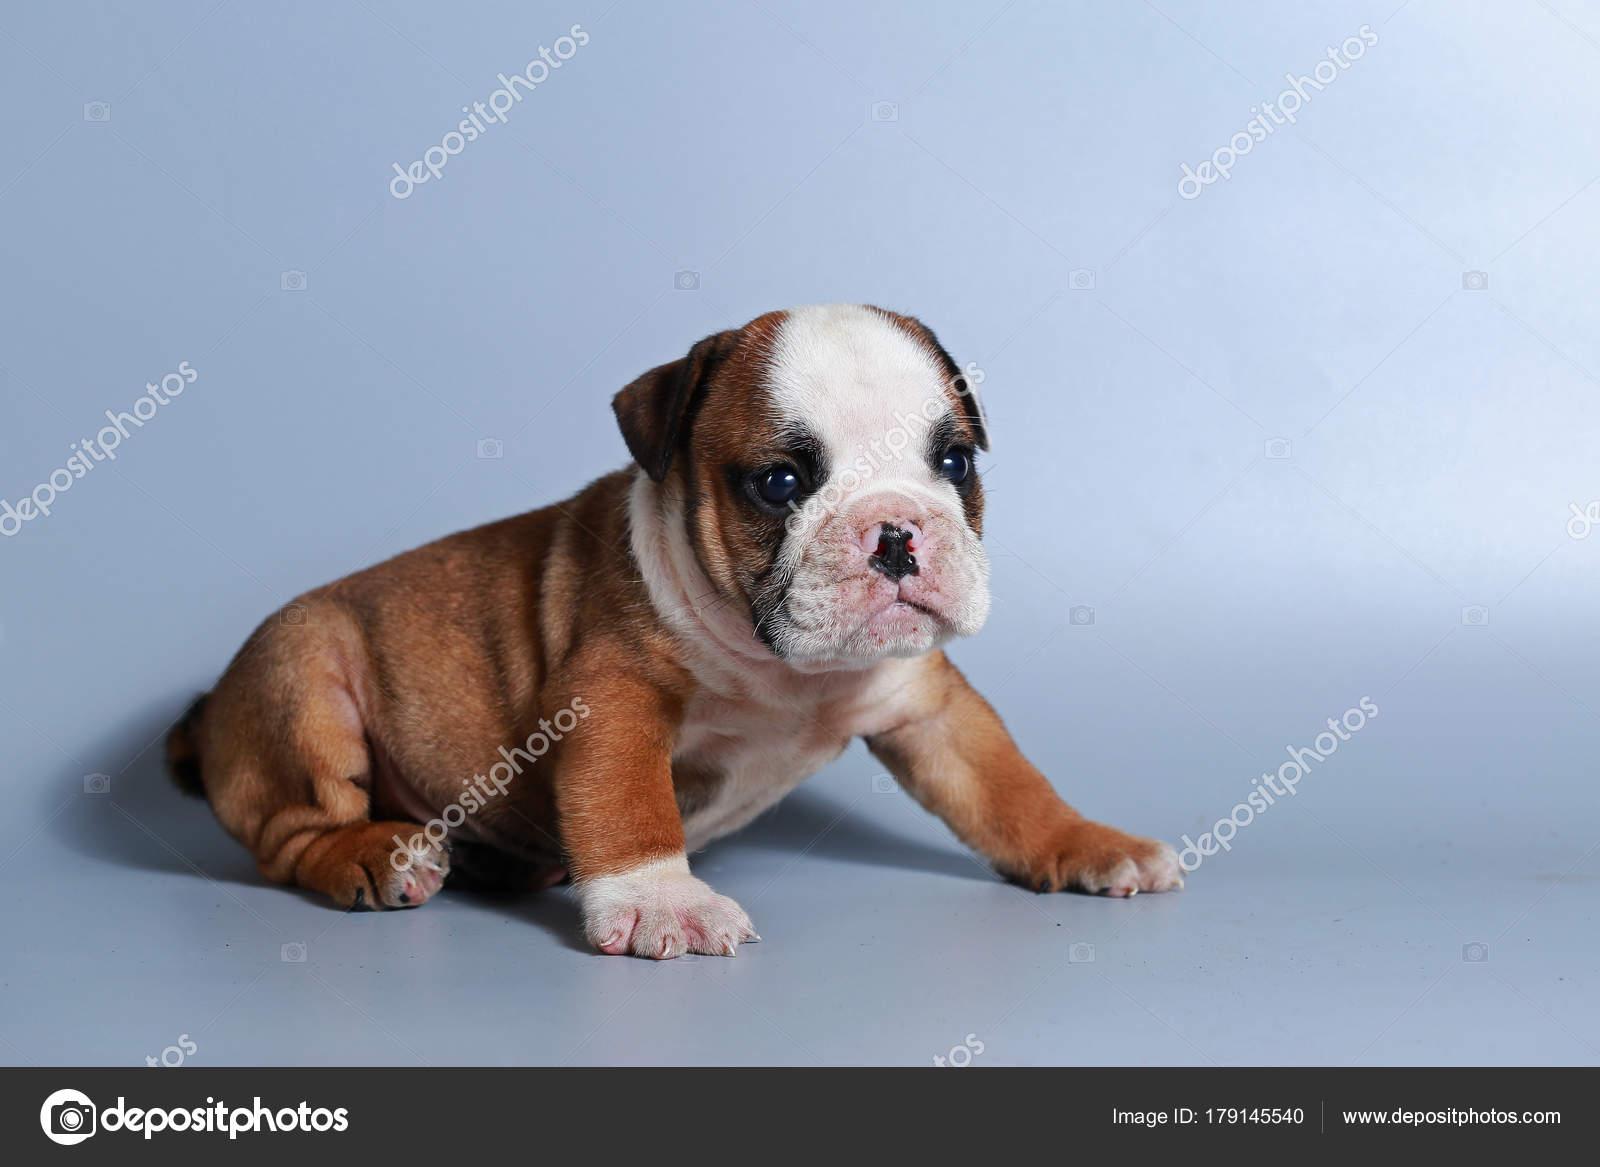 Month Purebred English Bulldog Puppy Gray Screen Stock Photo C S Thanawathreborn Gmail Com 179145540